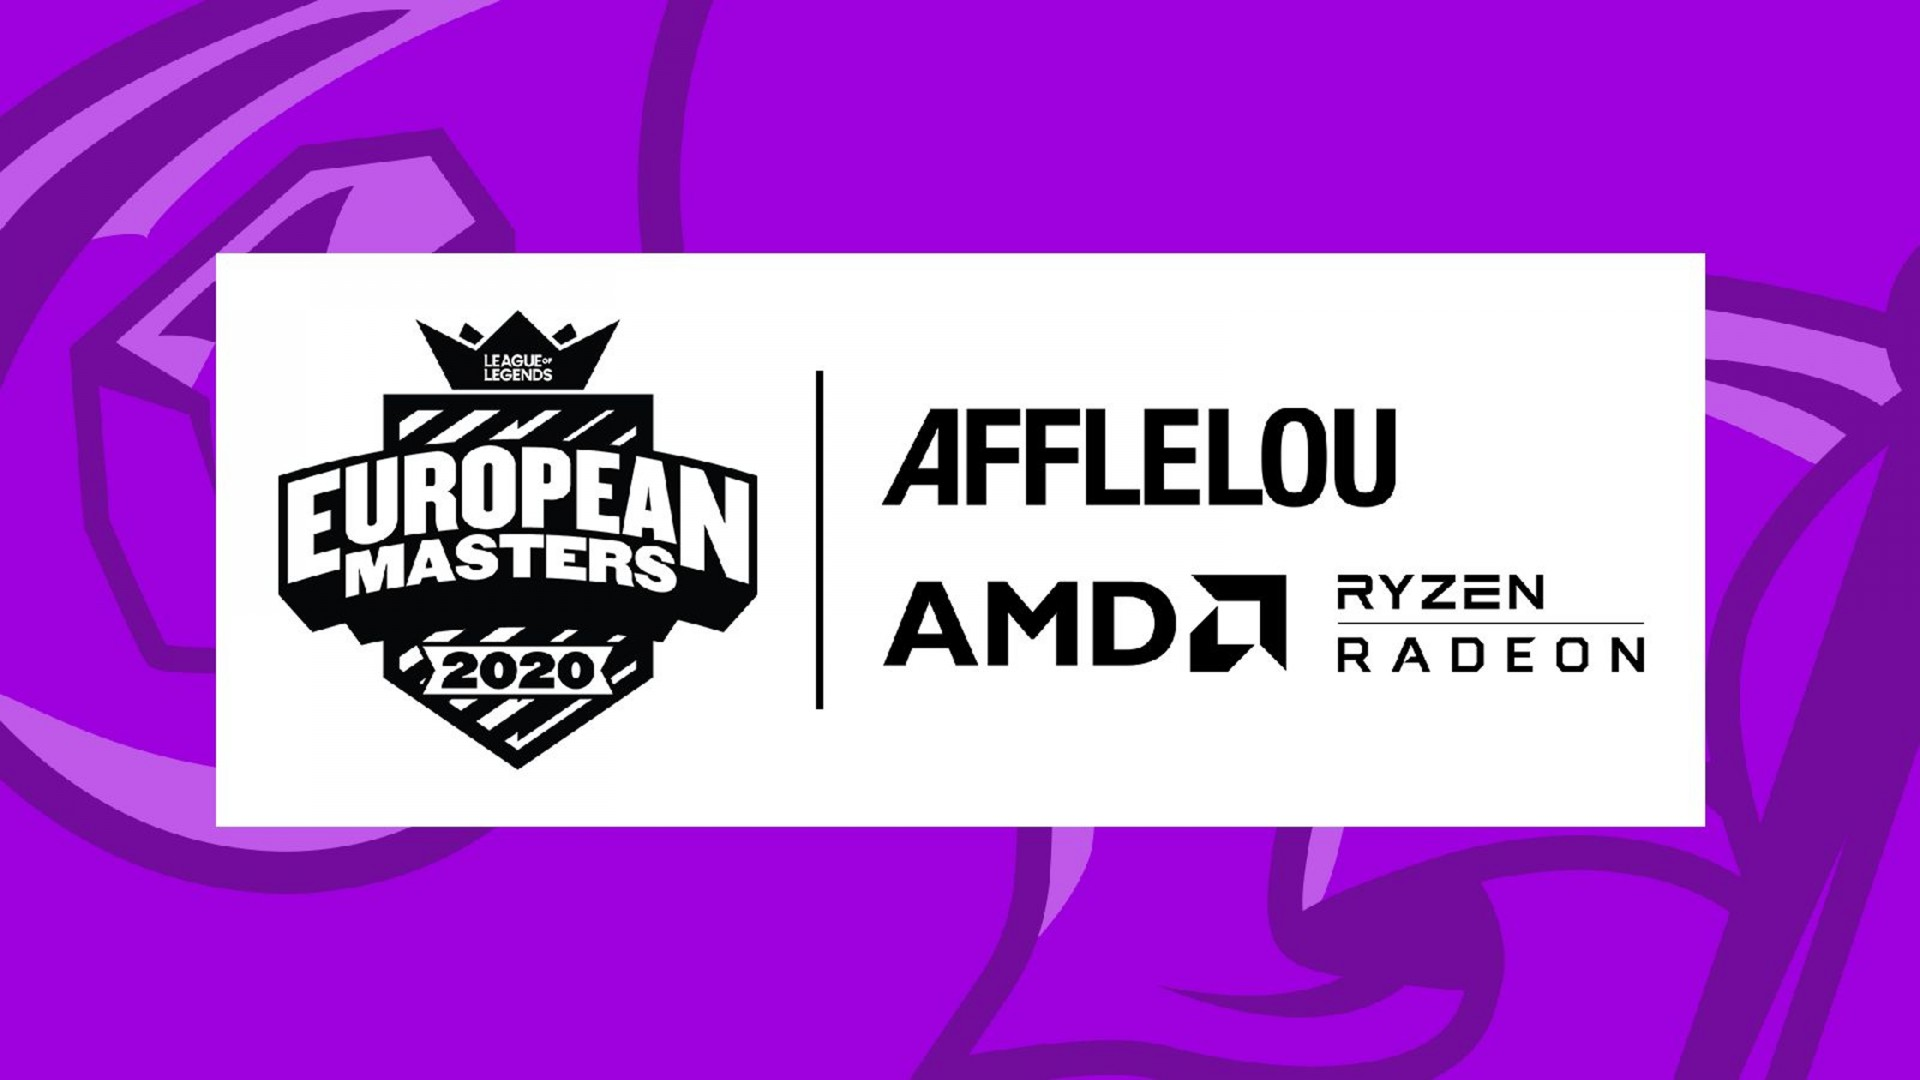 European Masters Afflelou AMD